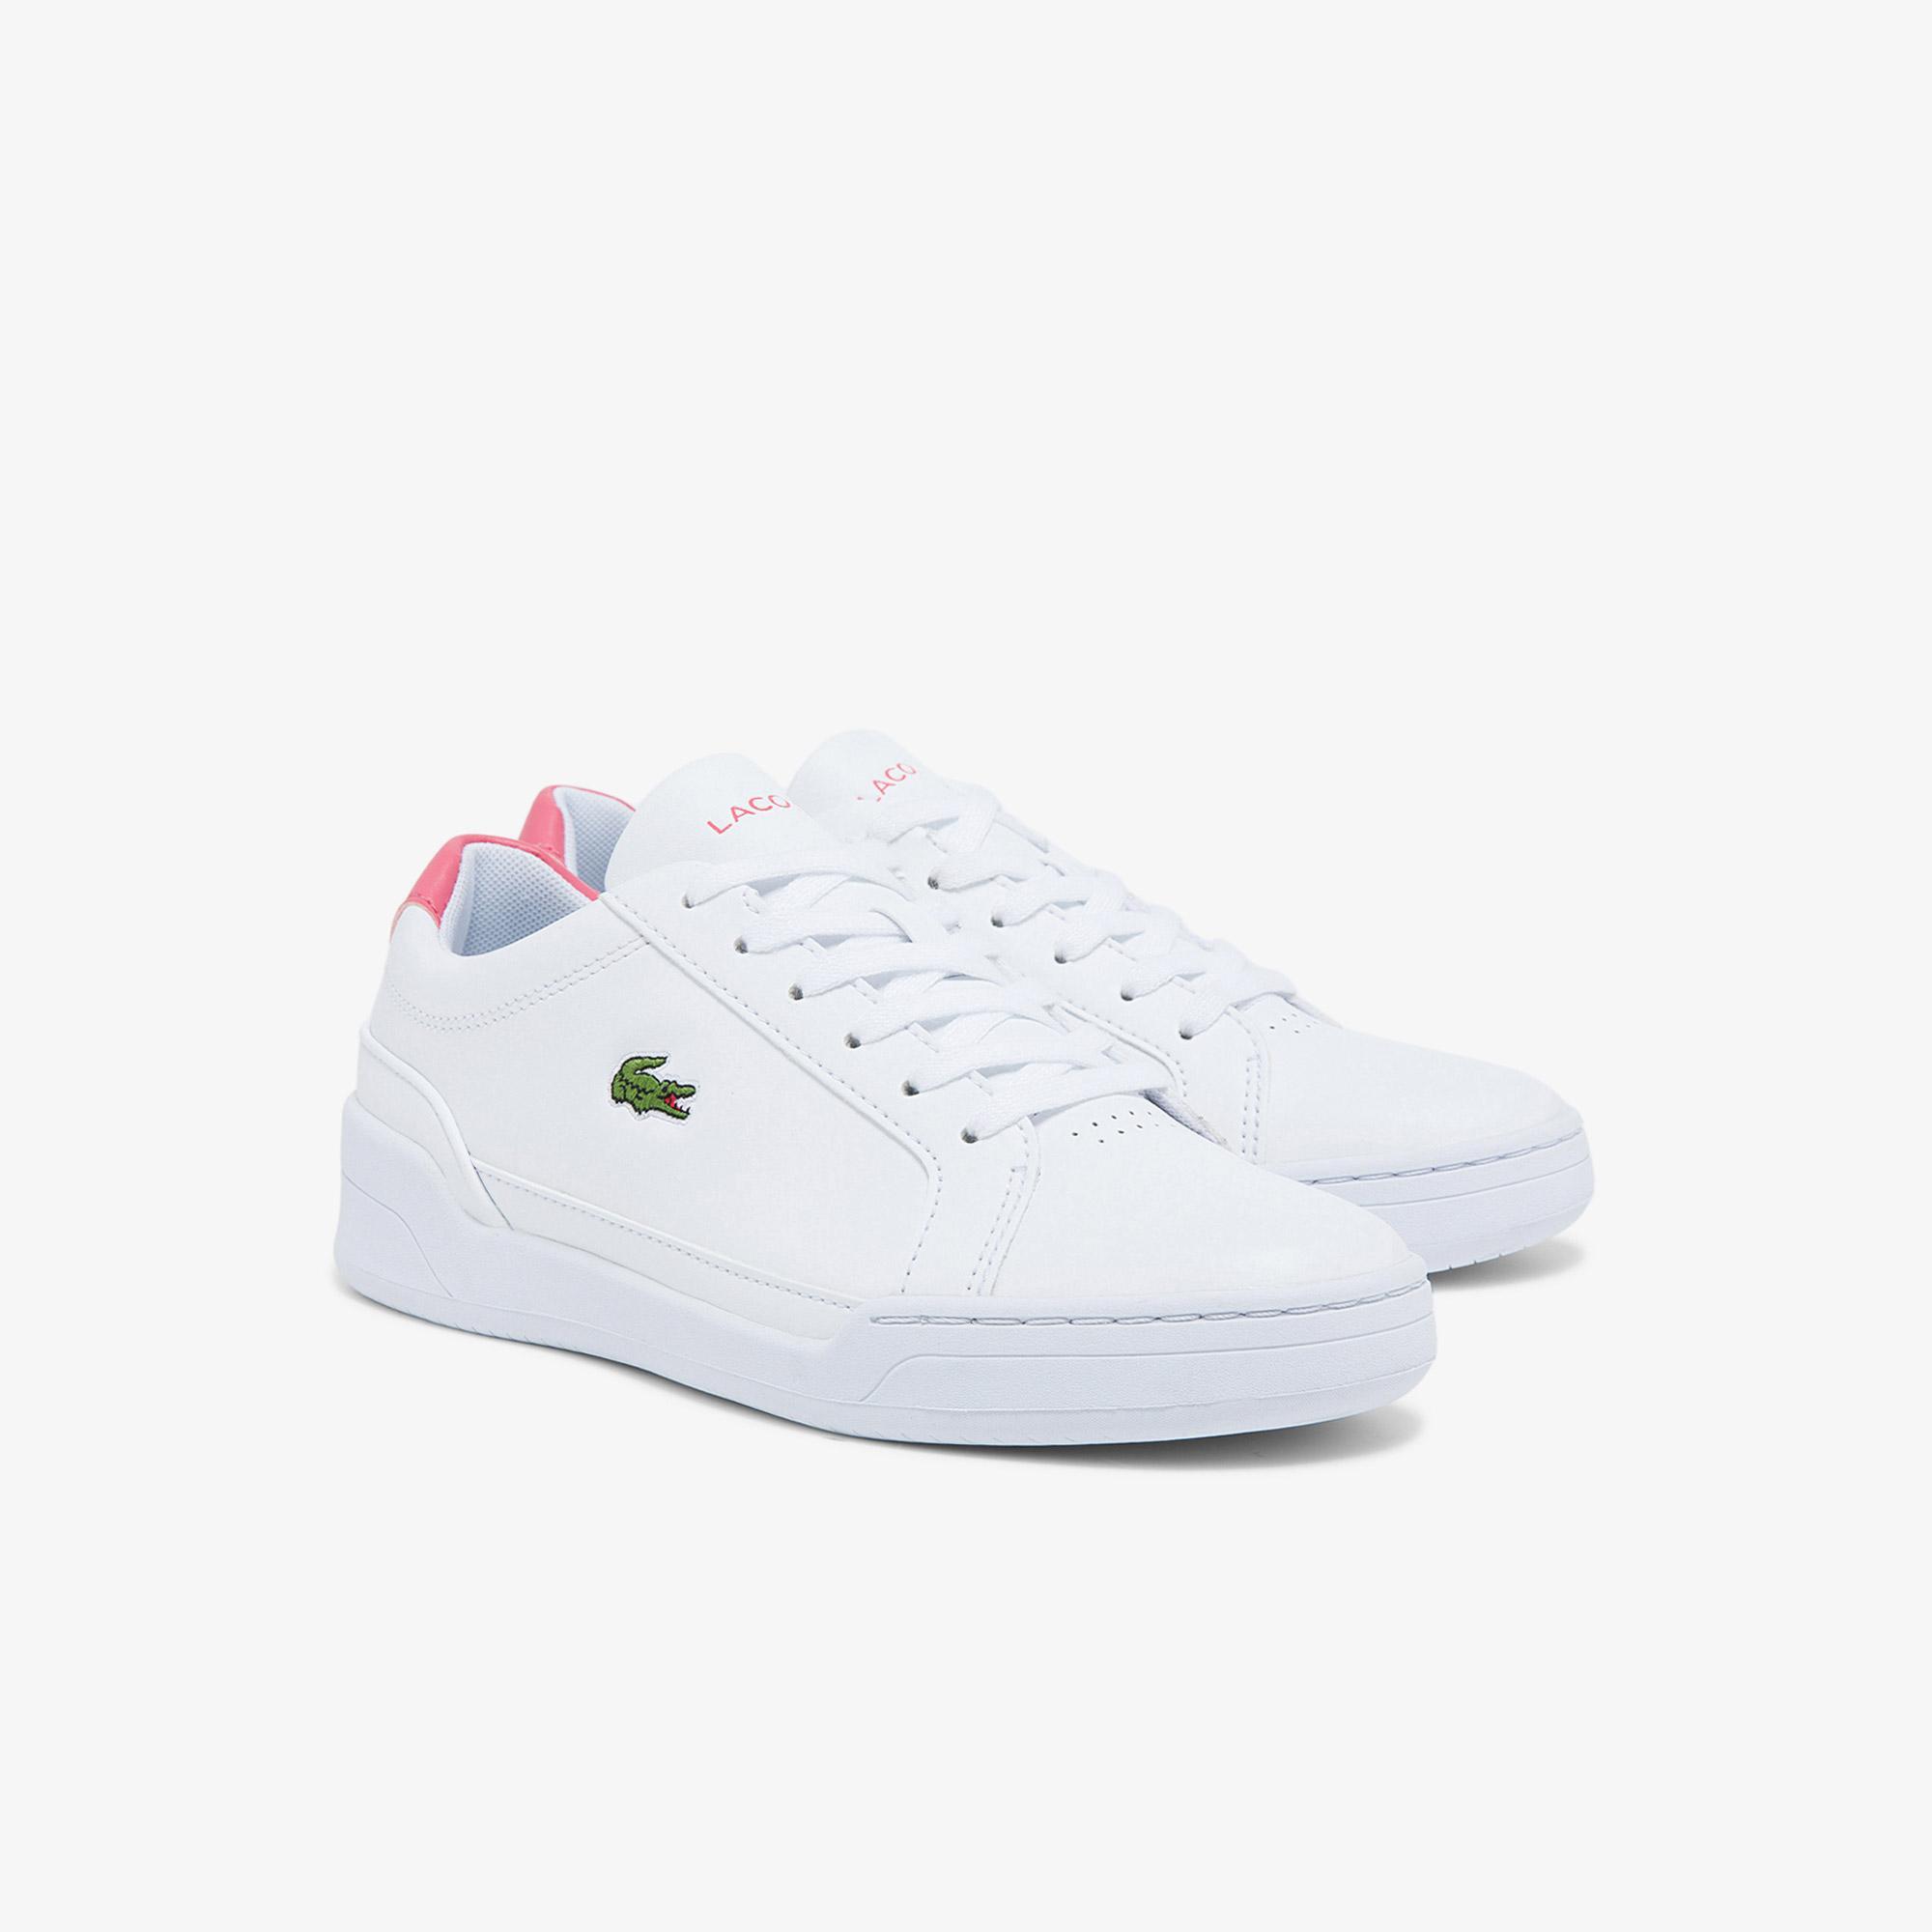 Lacoste Women's CHALLENGE Sneakers